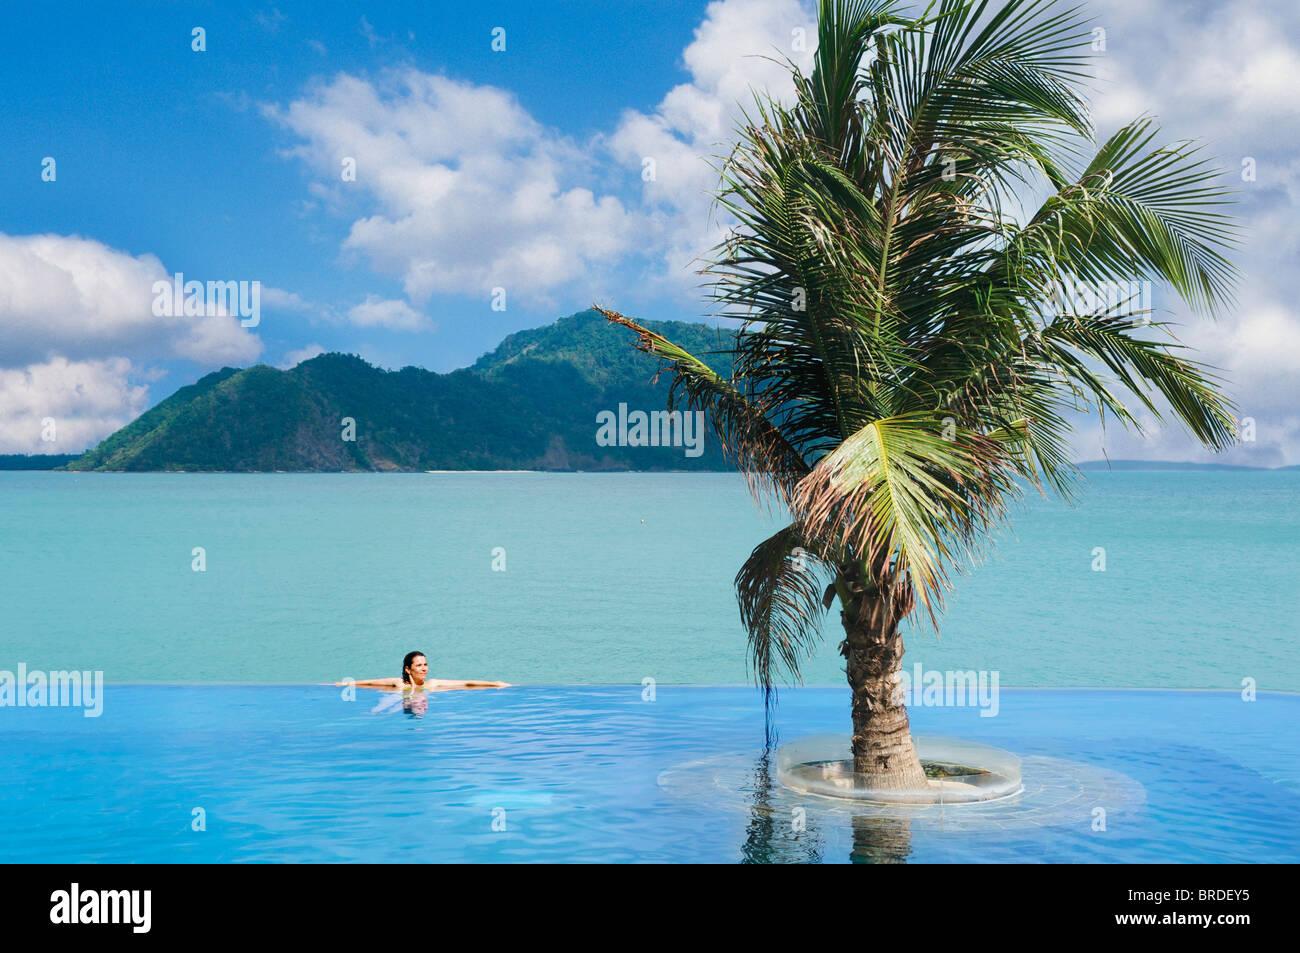 Evason Six Senses Spa Resort, Phuket, Thailand - Stock Image